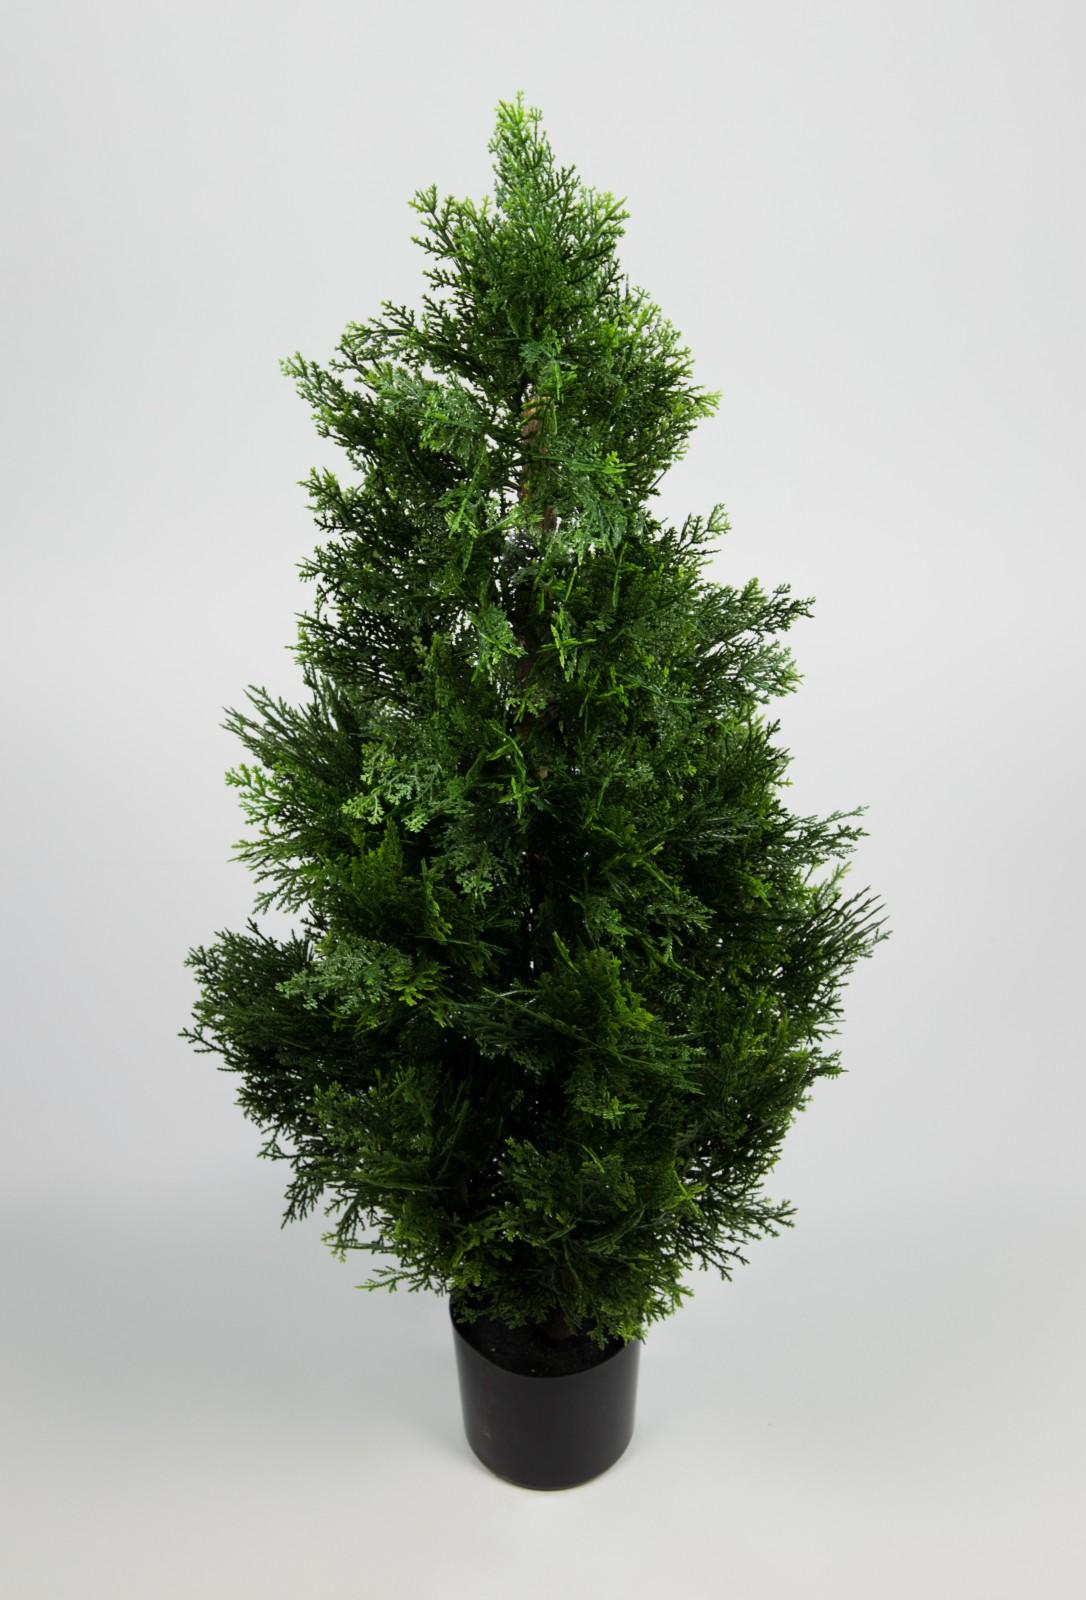 zeder konifere natura 90cm gr n la kunstpflanzen k nstliche pflanzen thuja ebay. Black Bedroom Furniture Sets. Home Design Ideas